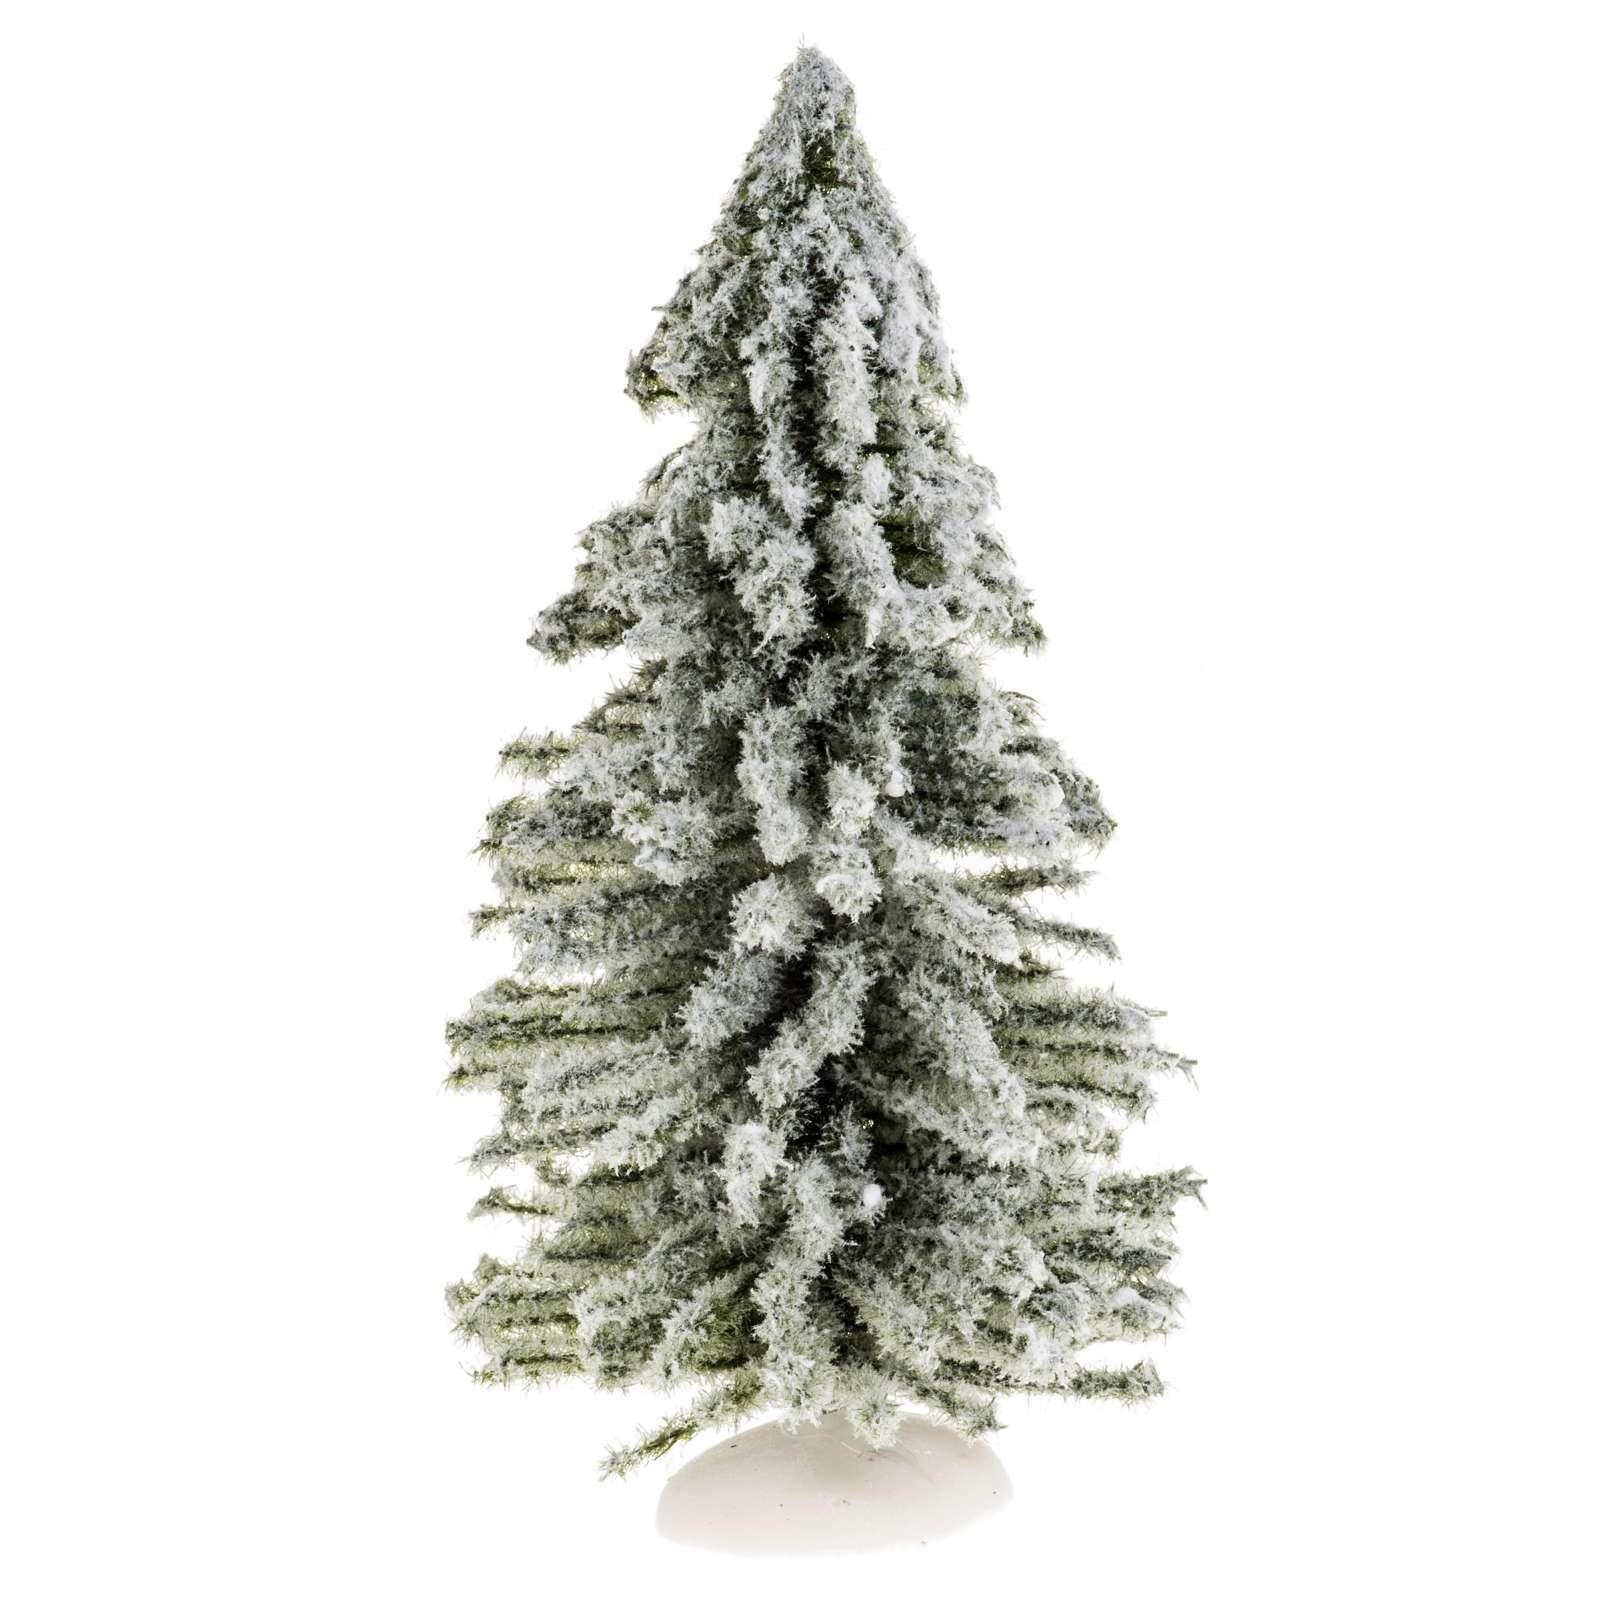 Nativity accessory, snowy fir tree H15cm 4